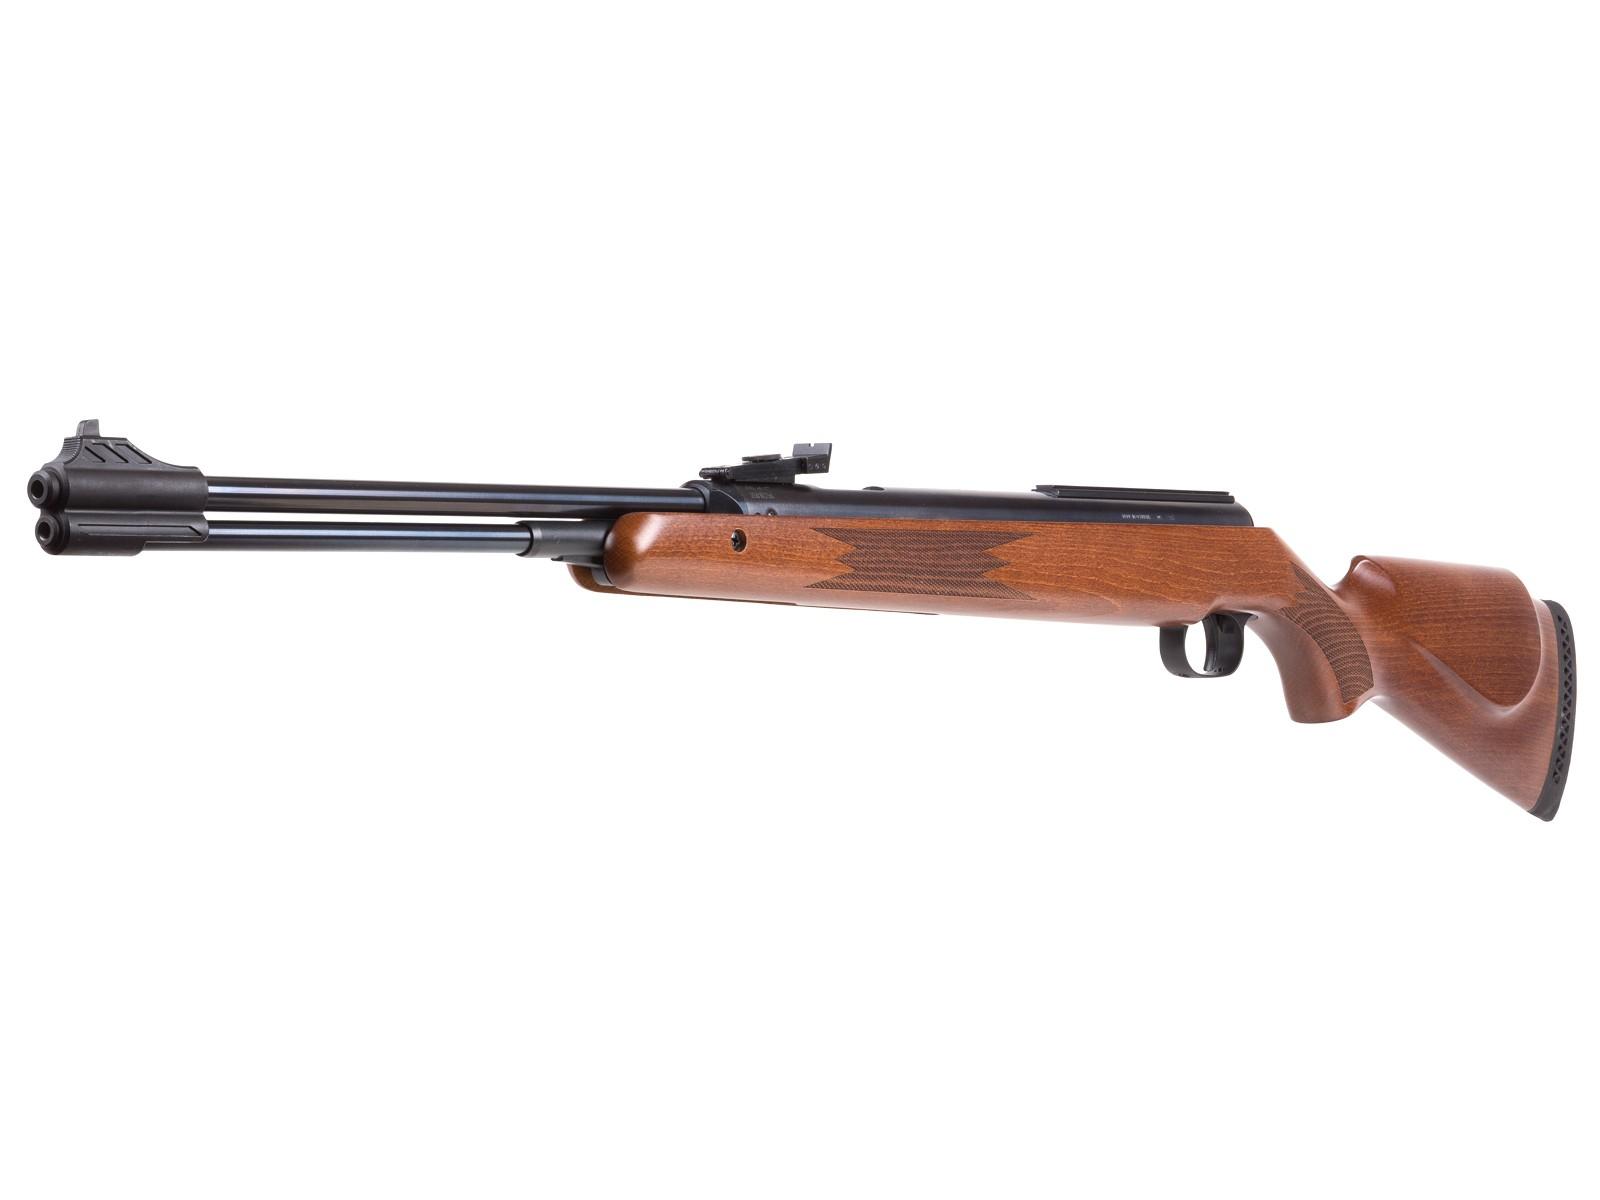 choisir une carabine à air comprimé: les AC à piston (ressort-vérin) magnum PY-1204_Diana-RWS-460-Magnum_1550698644